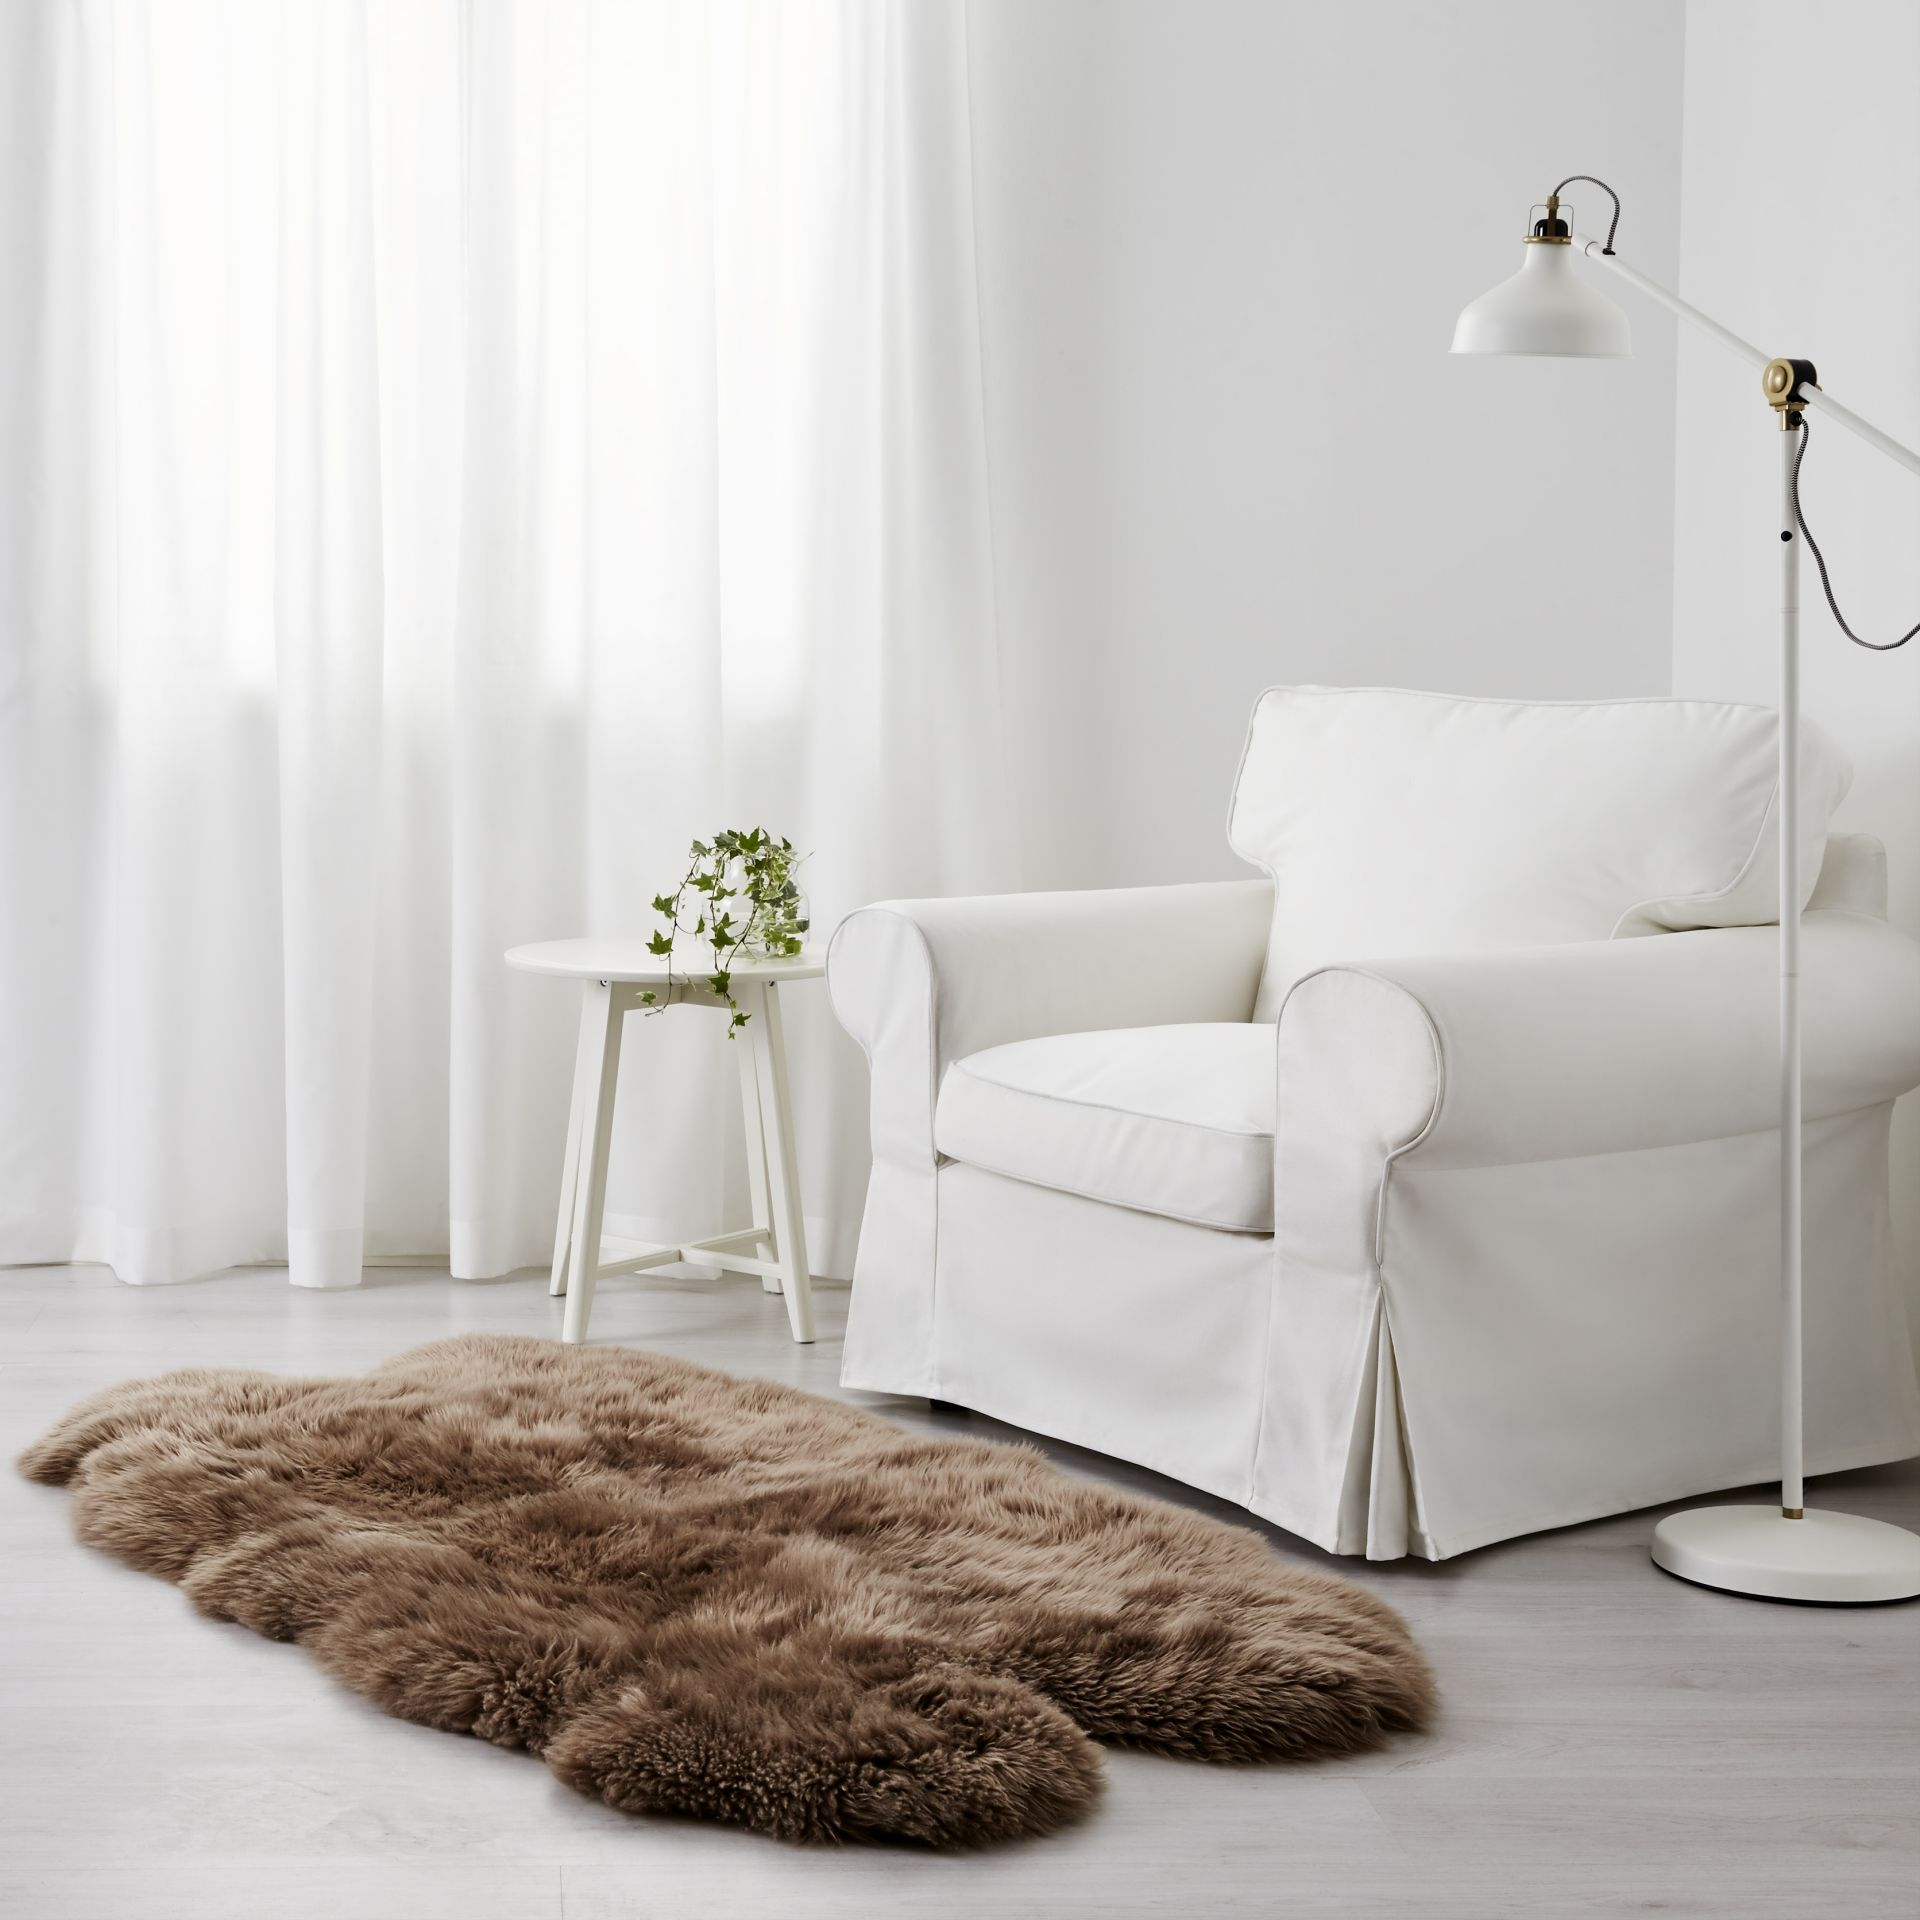 SKOLD Schapenvacht, beige | Pinterest | Catalog